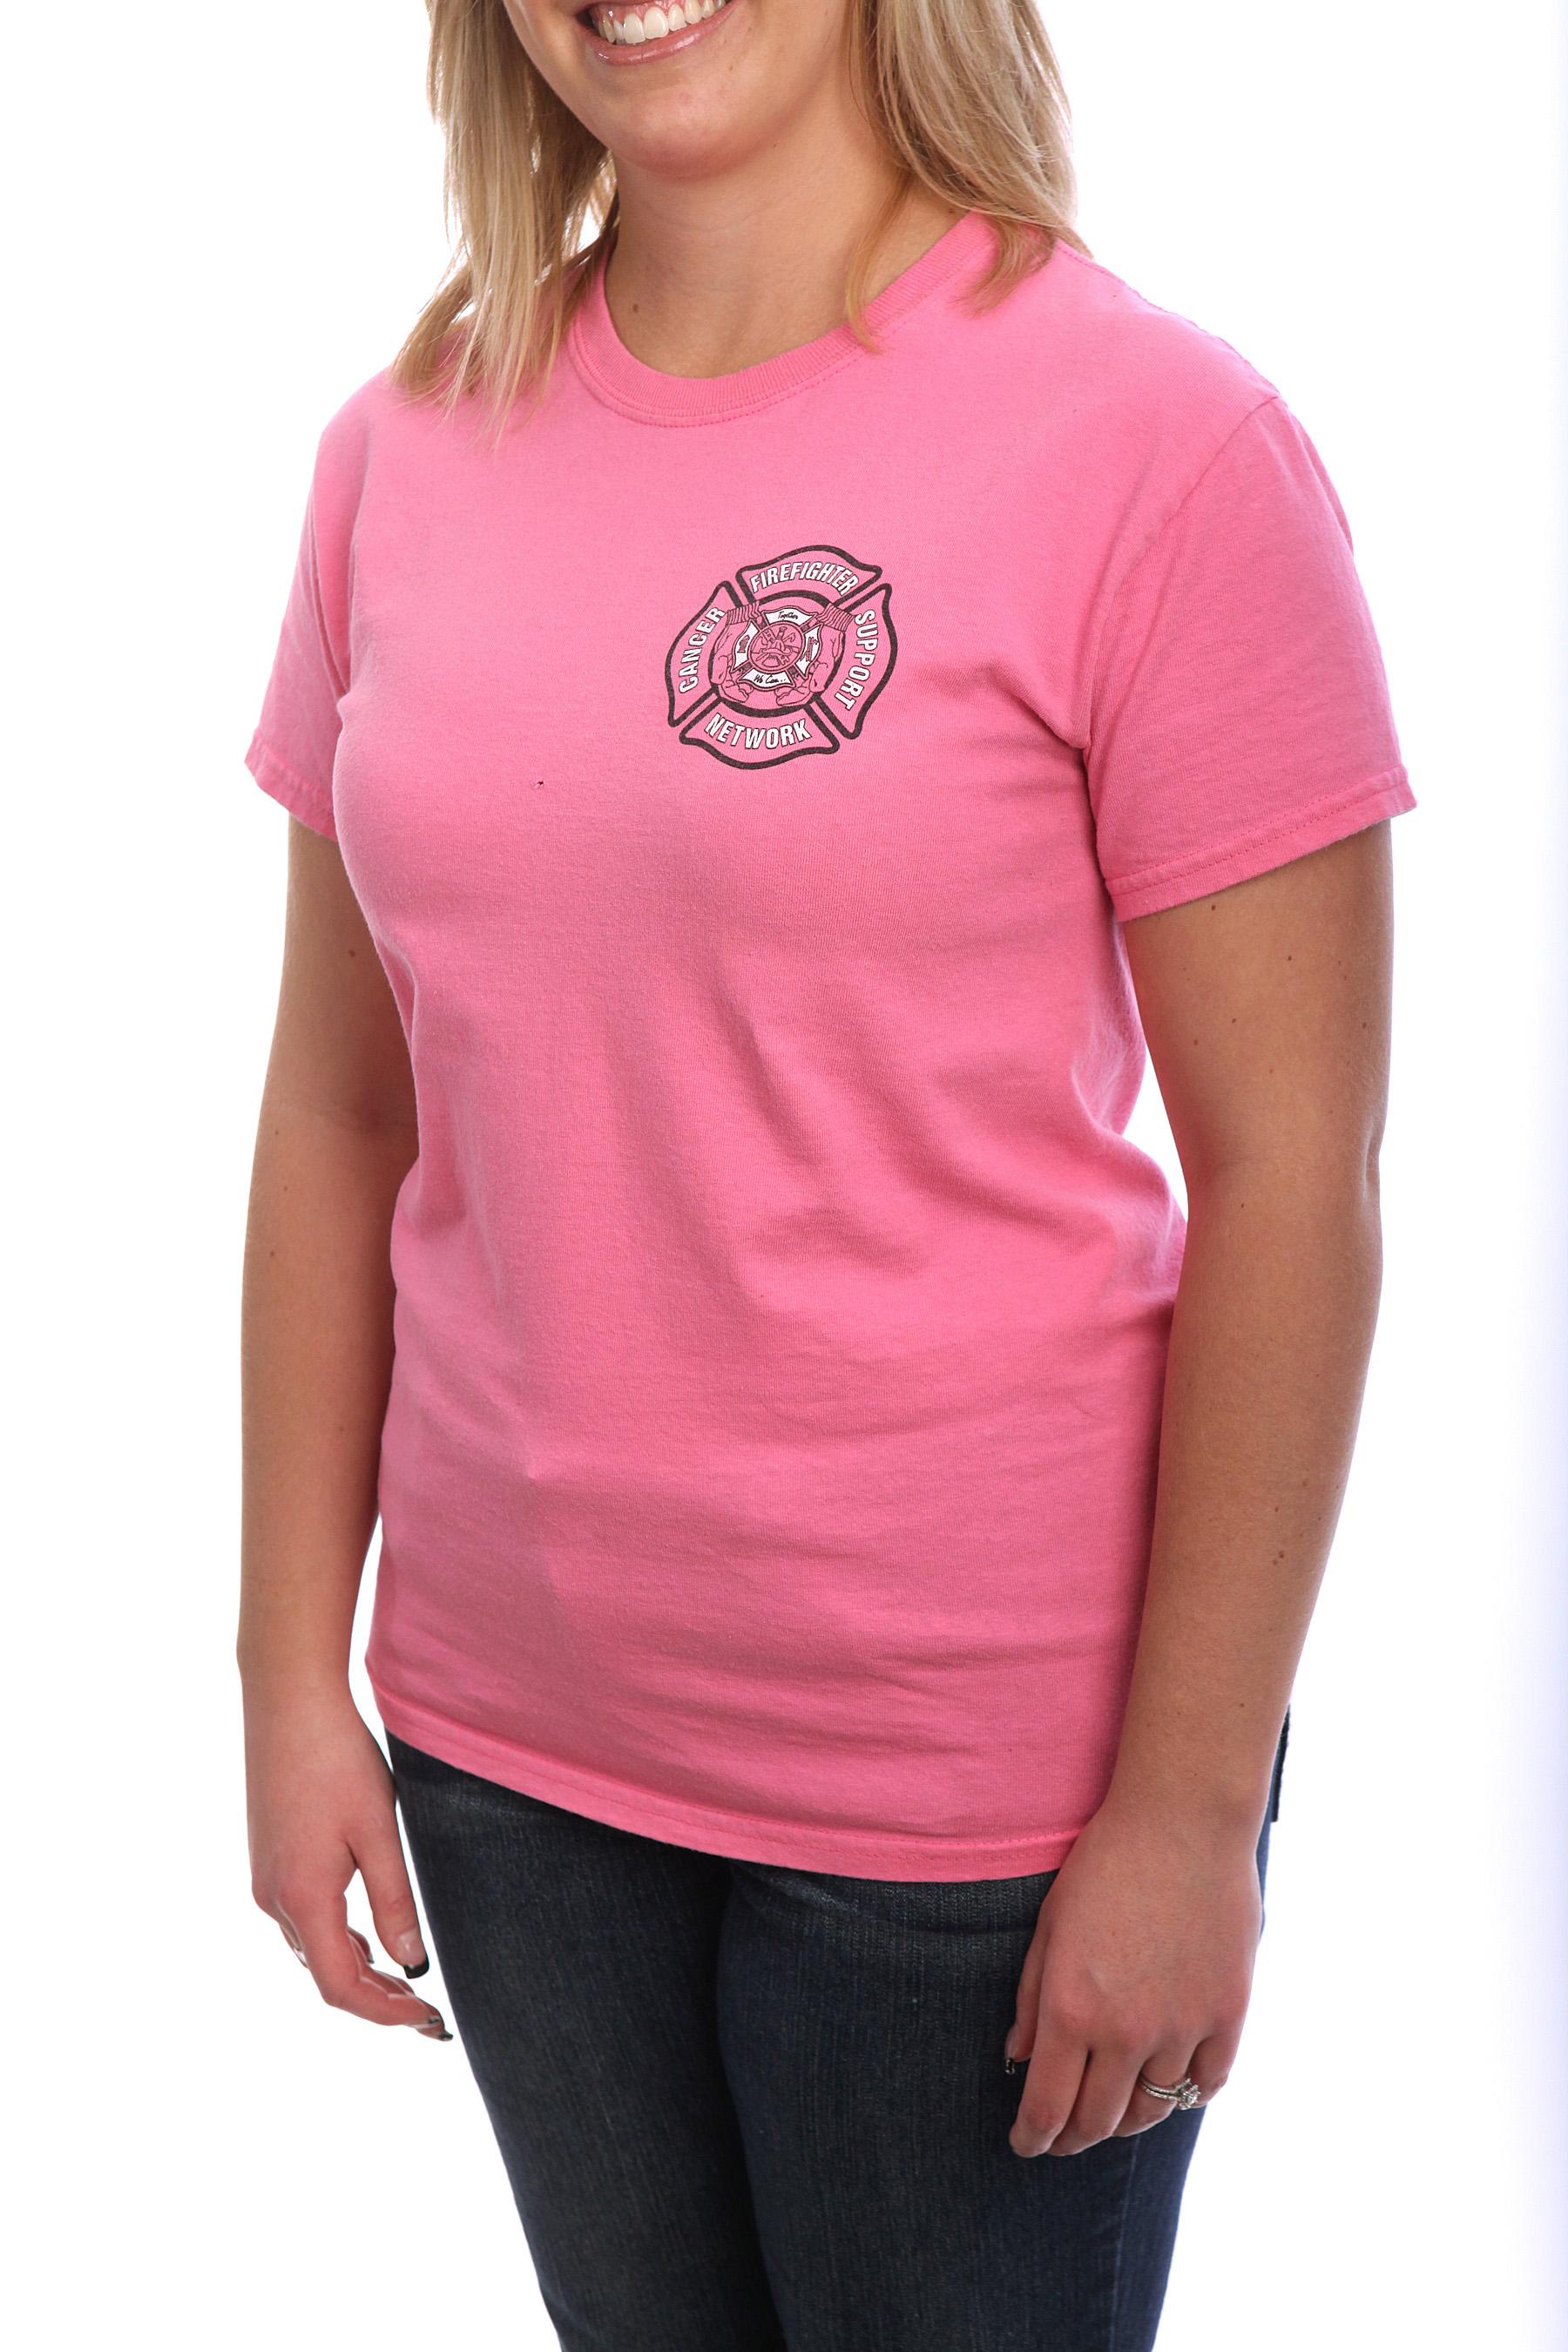 Fight Cancer With Fire - Phenix Helmet Women's T-Shirt